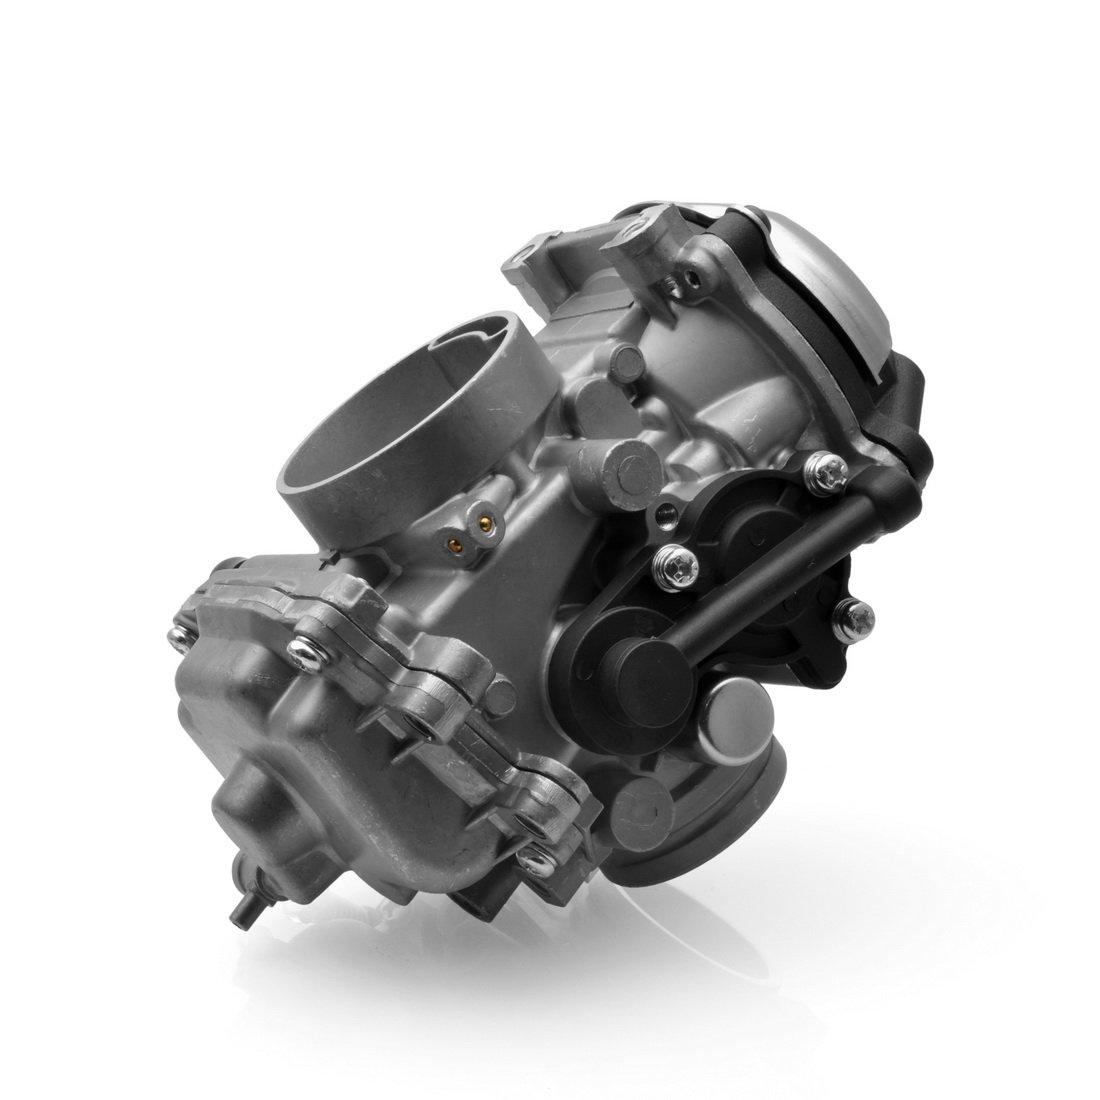 Radracing ATV Carburetor Carb Replacement Kit for Yamaha Bear Tracker 250 YFM250 YFM 250 1999-2004